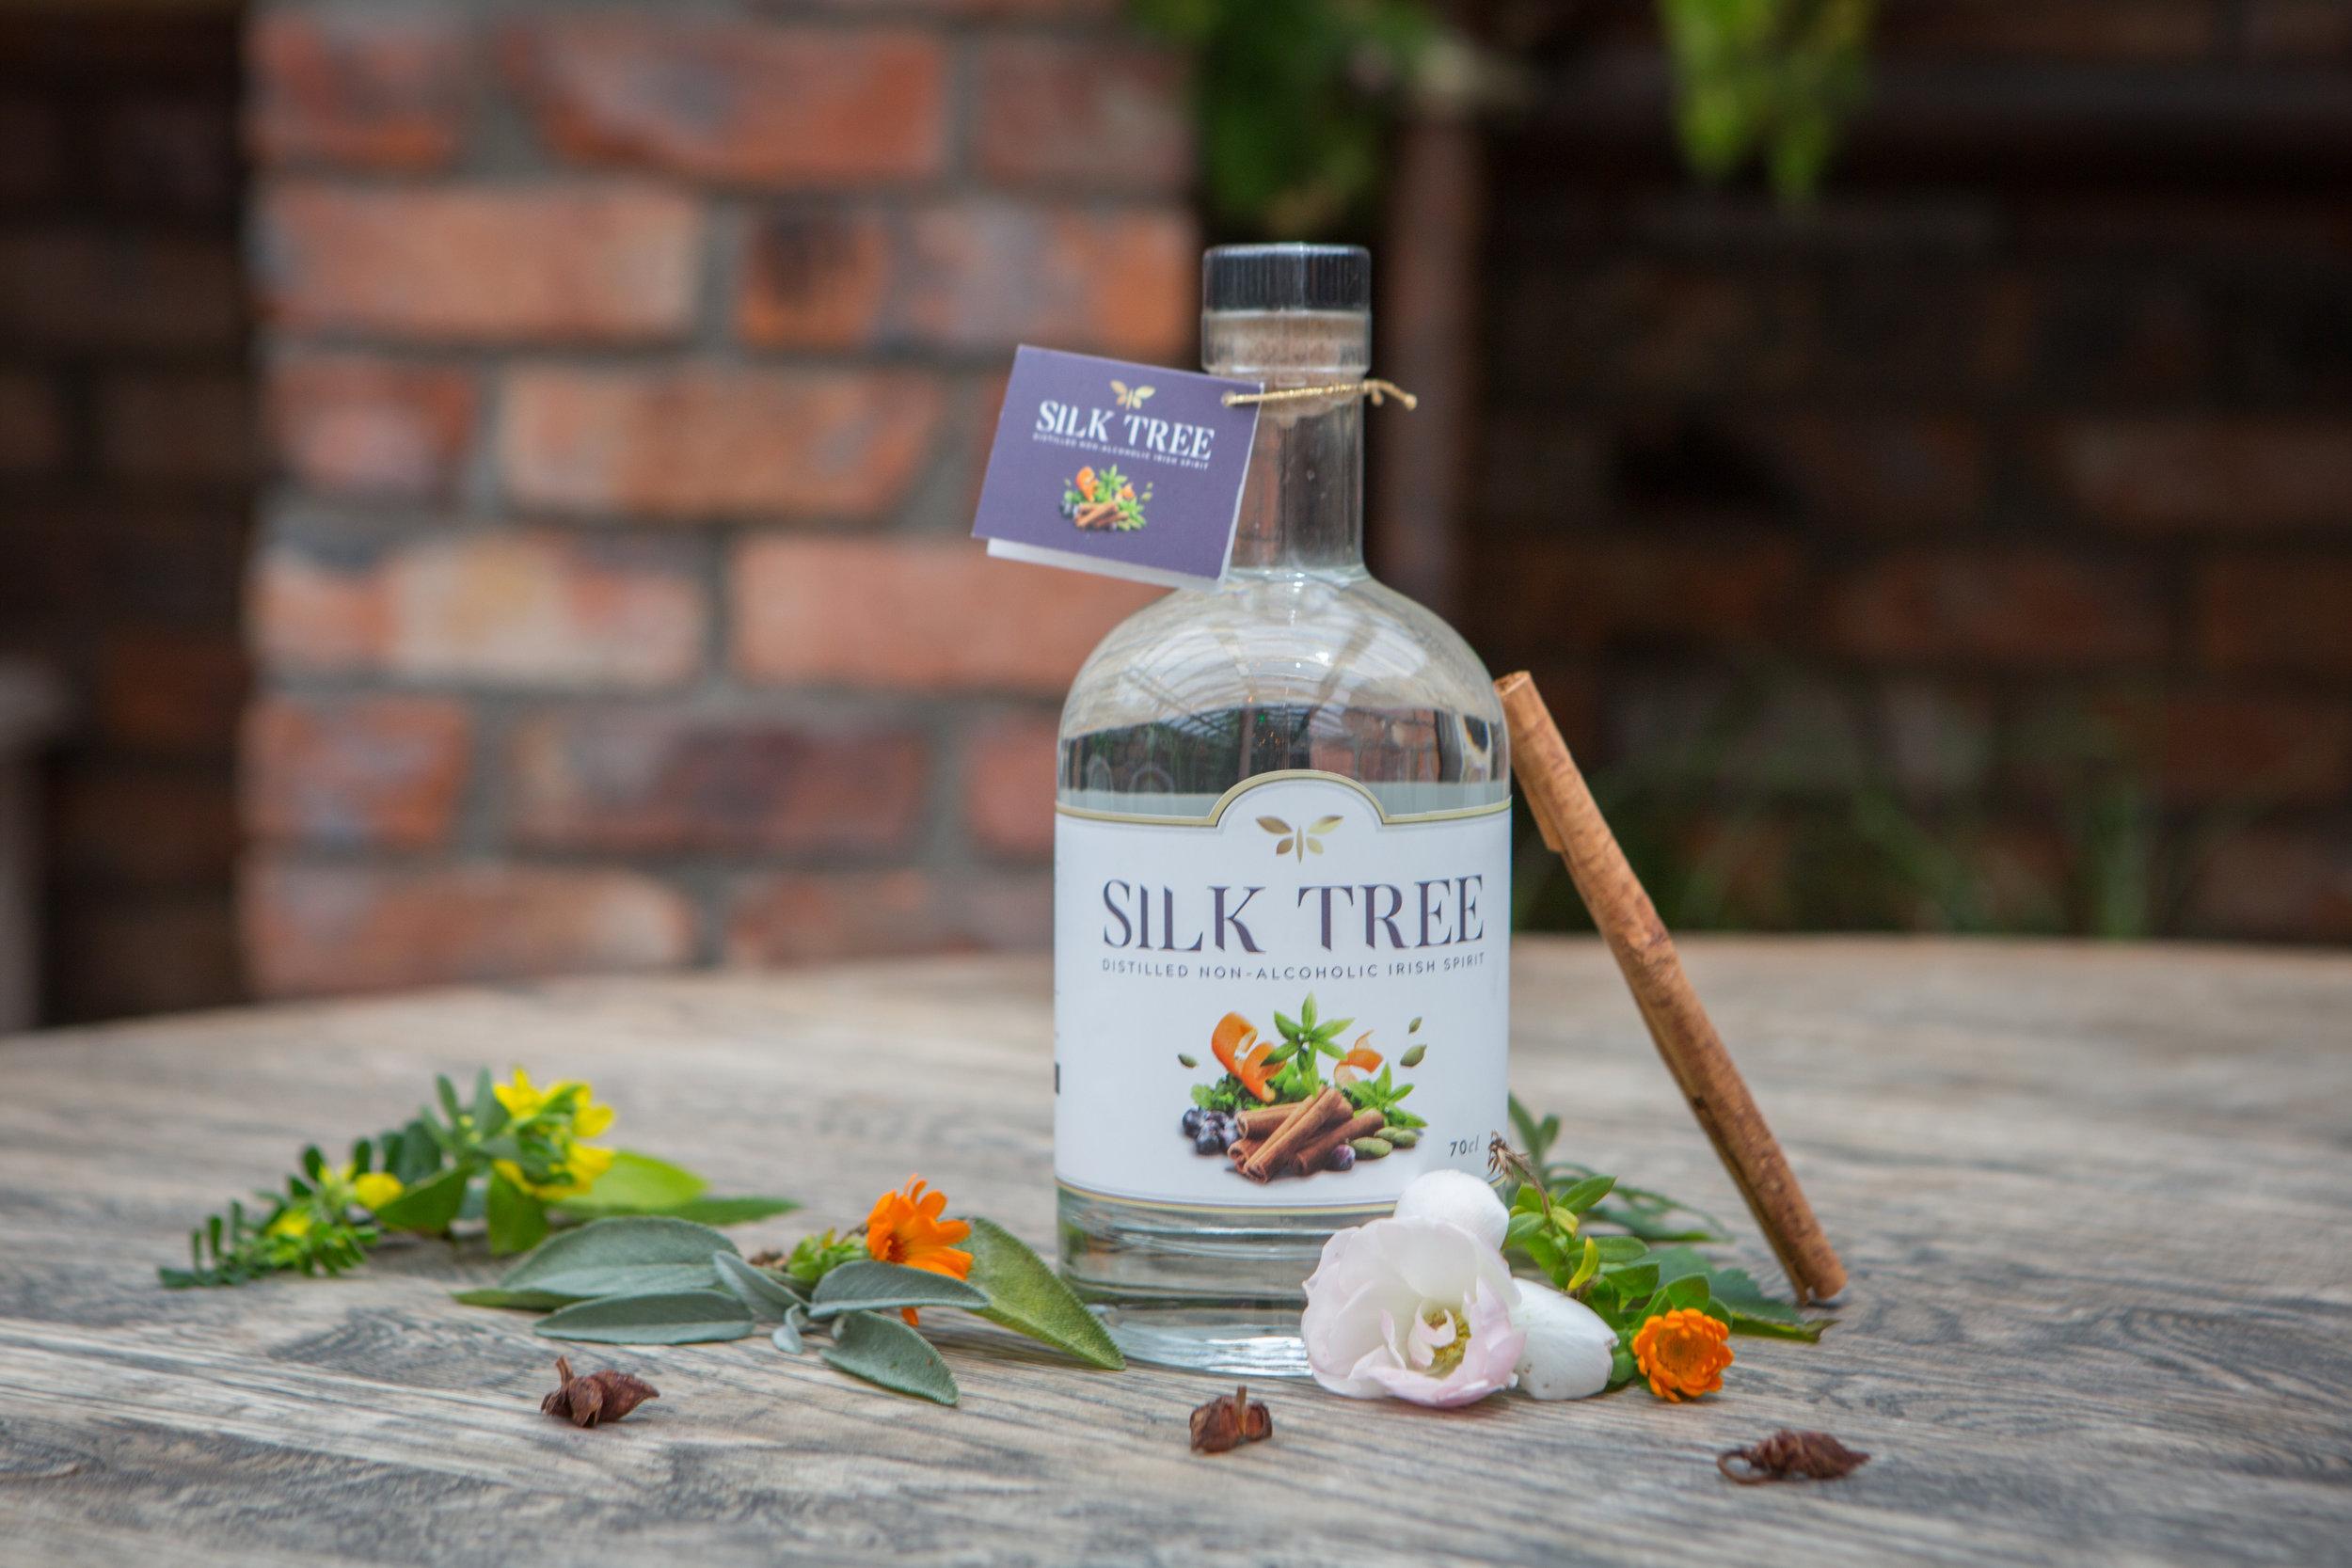 Silk Tree 0.5% gin alternative spirit